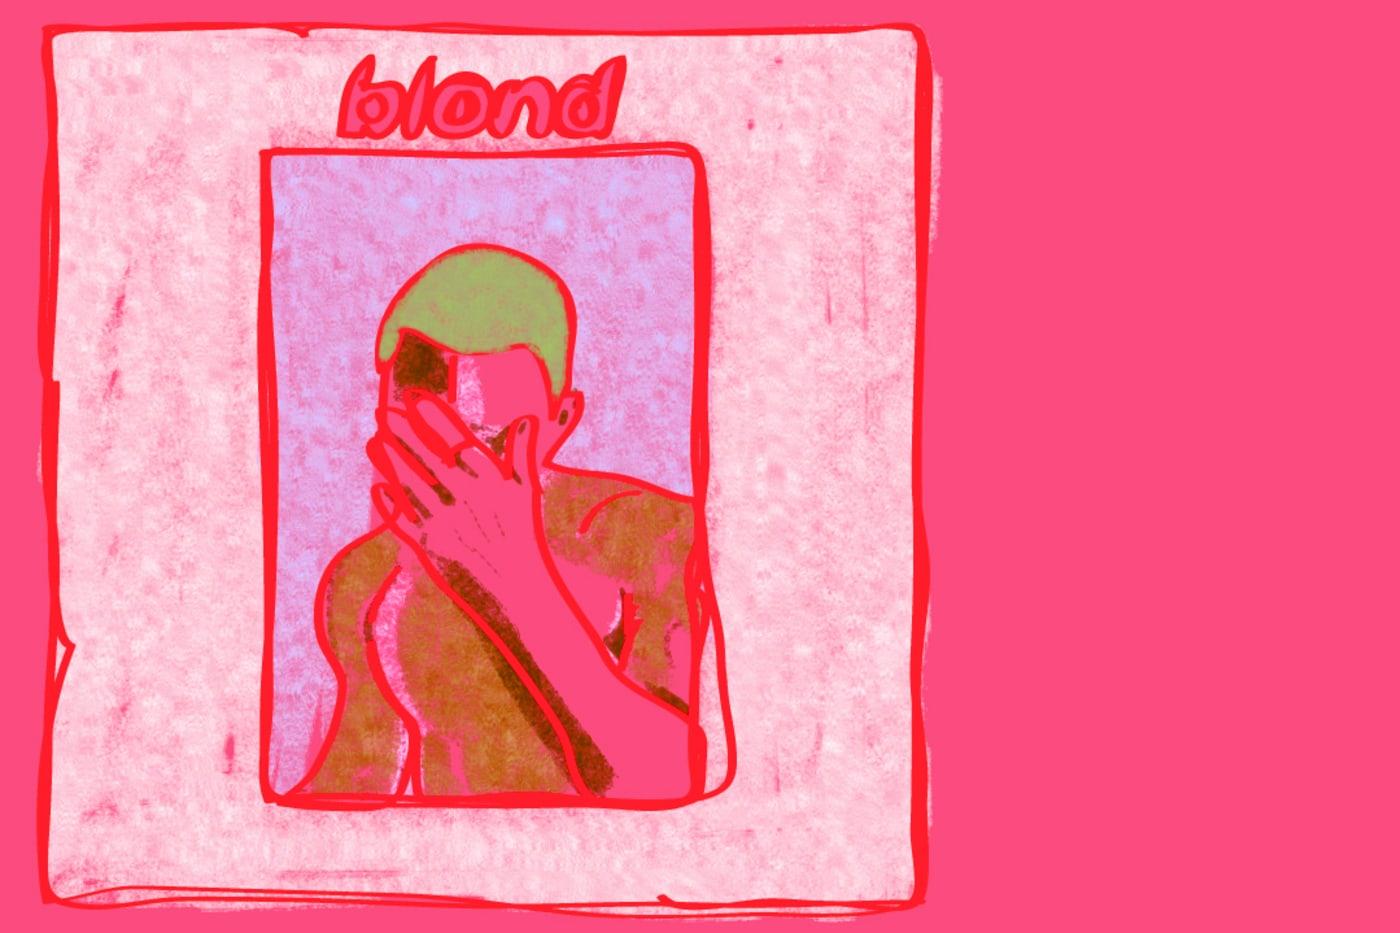 blond blonde frank